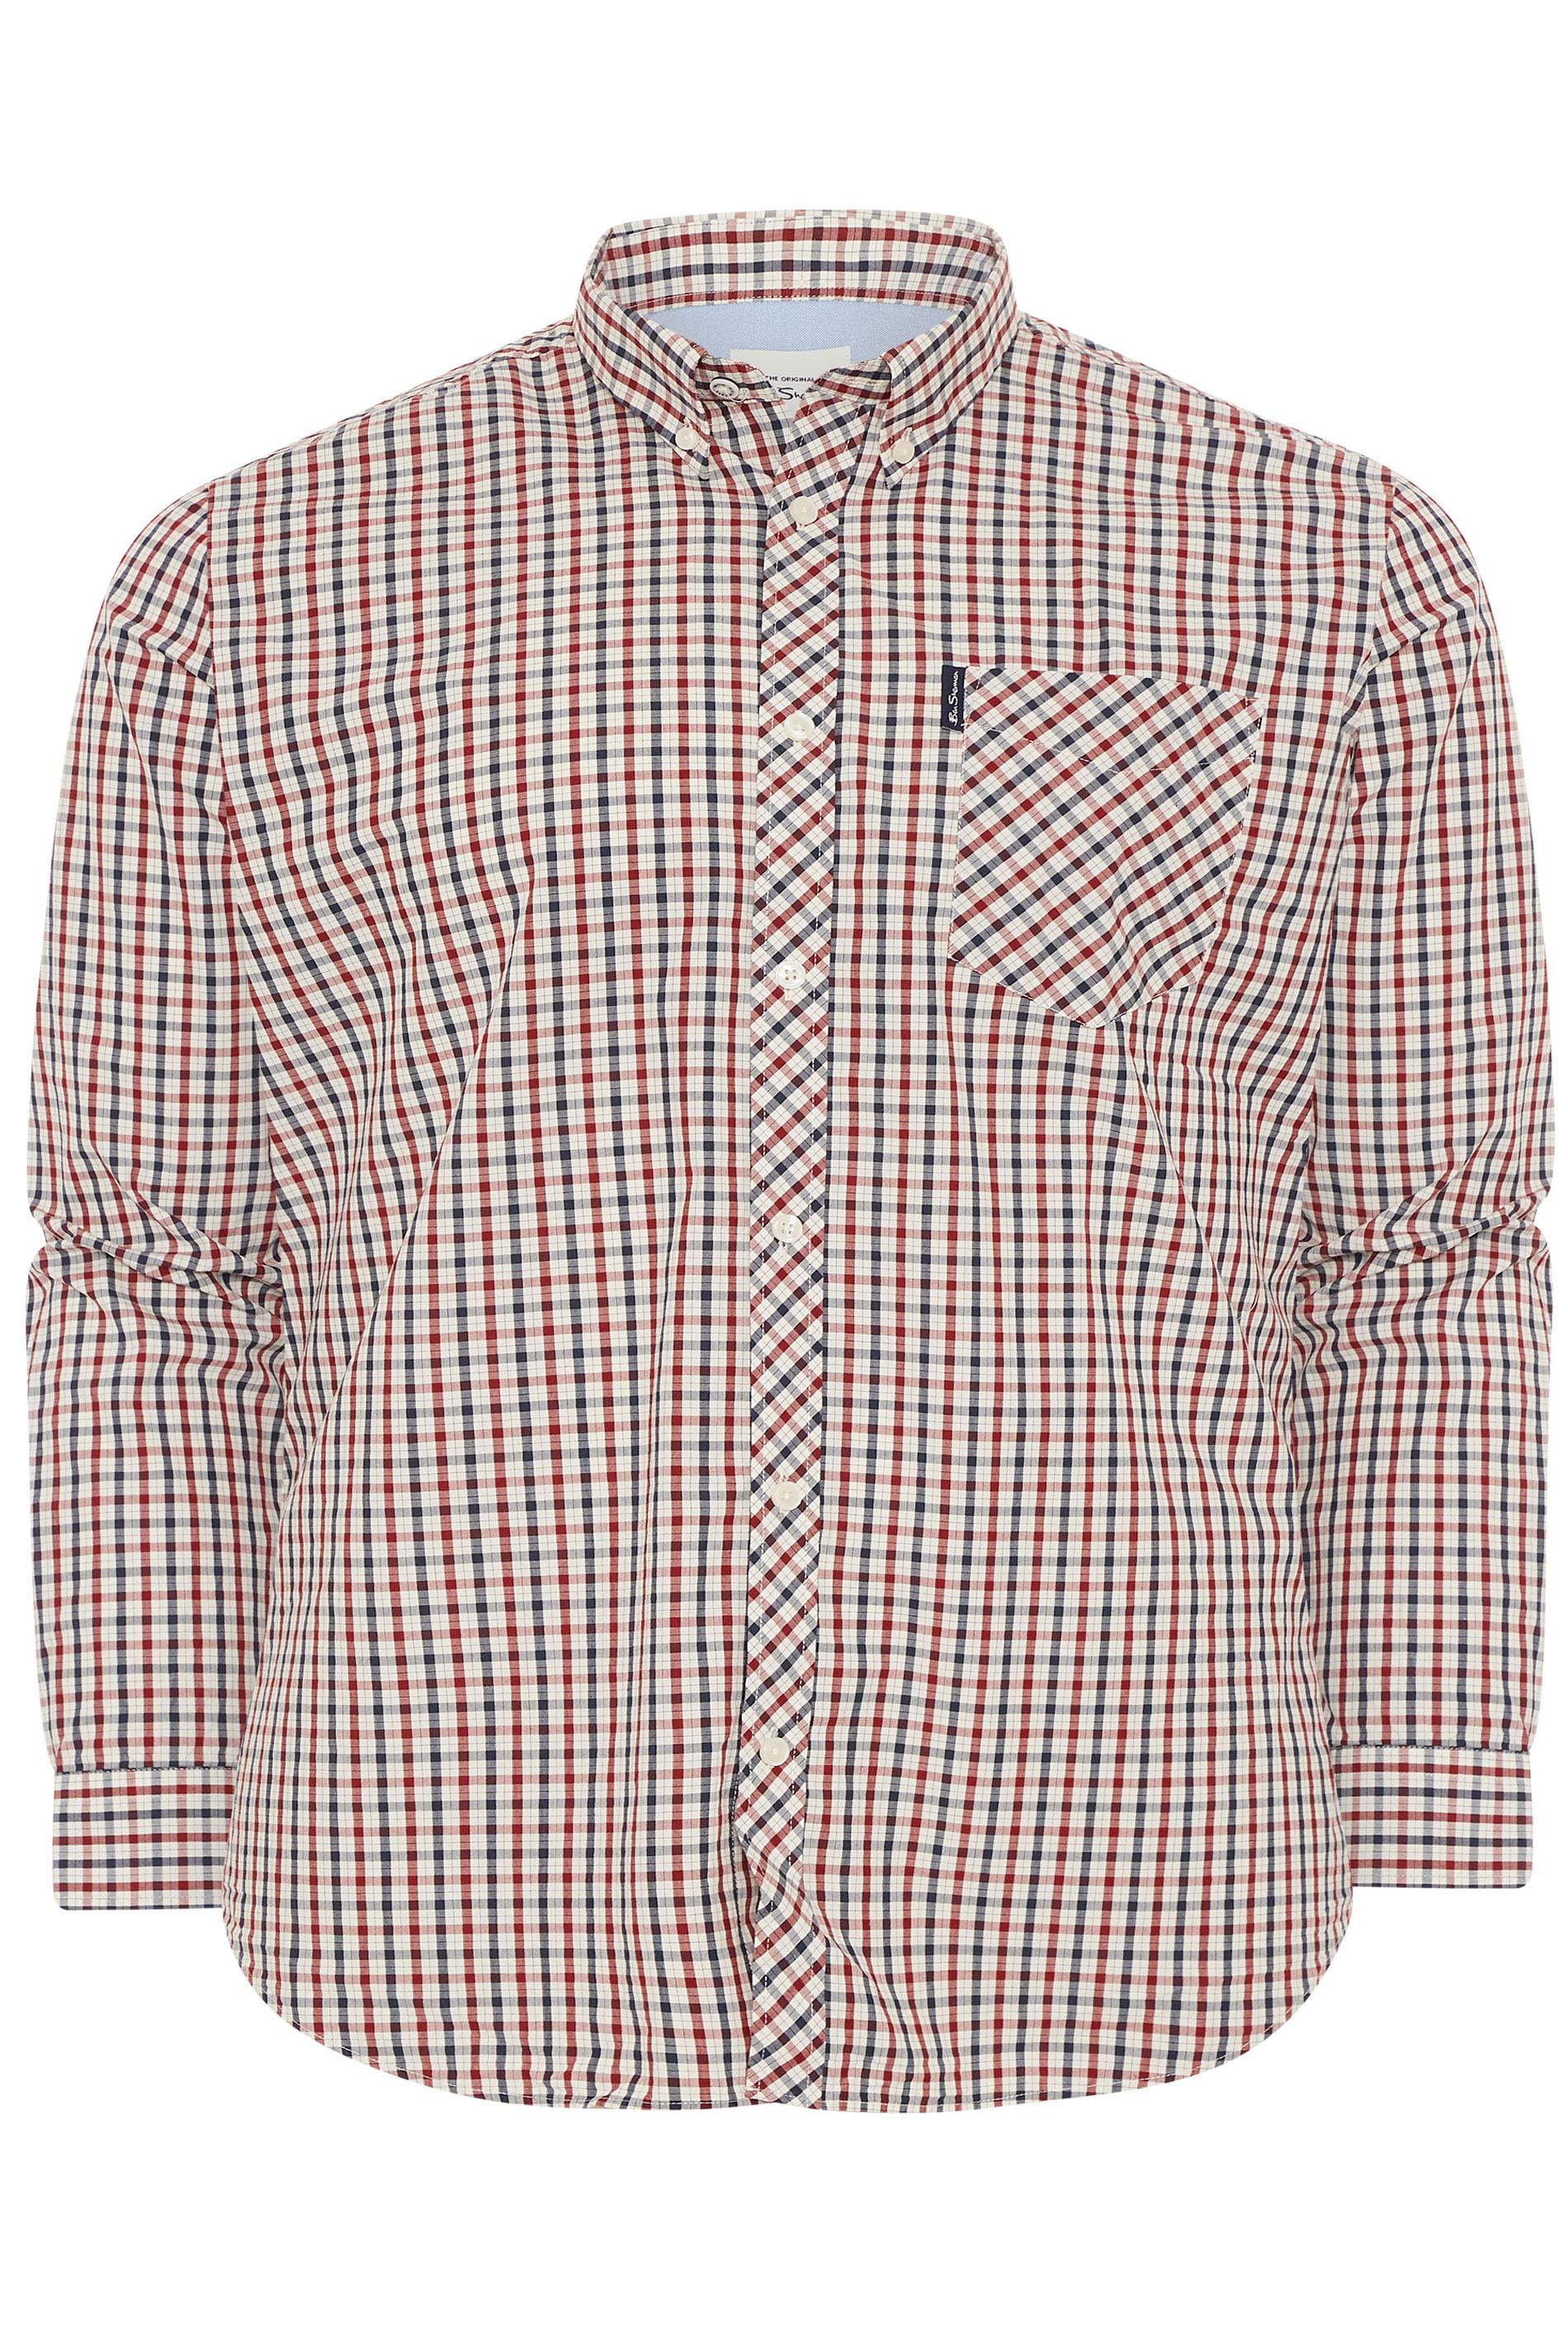 BEN SHERMAN Red Check Signature Long Sleeve Oxford Shirt